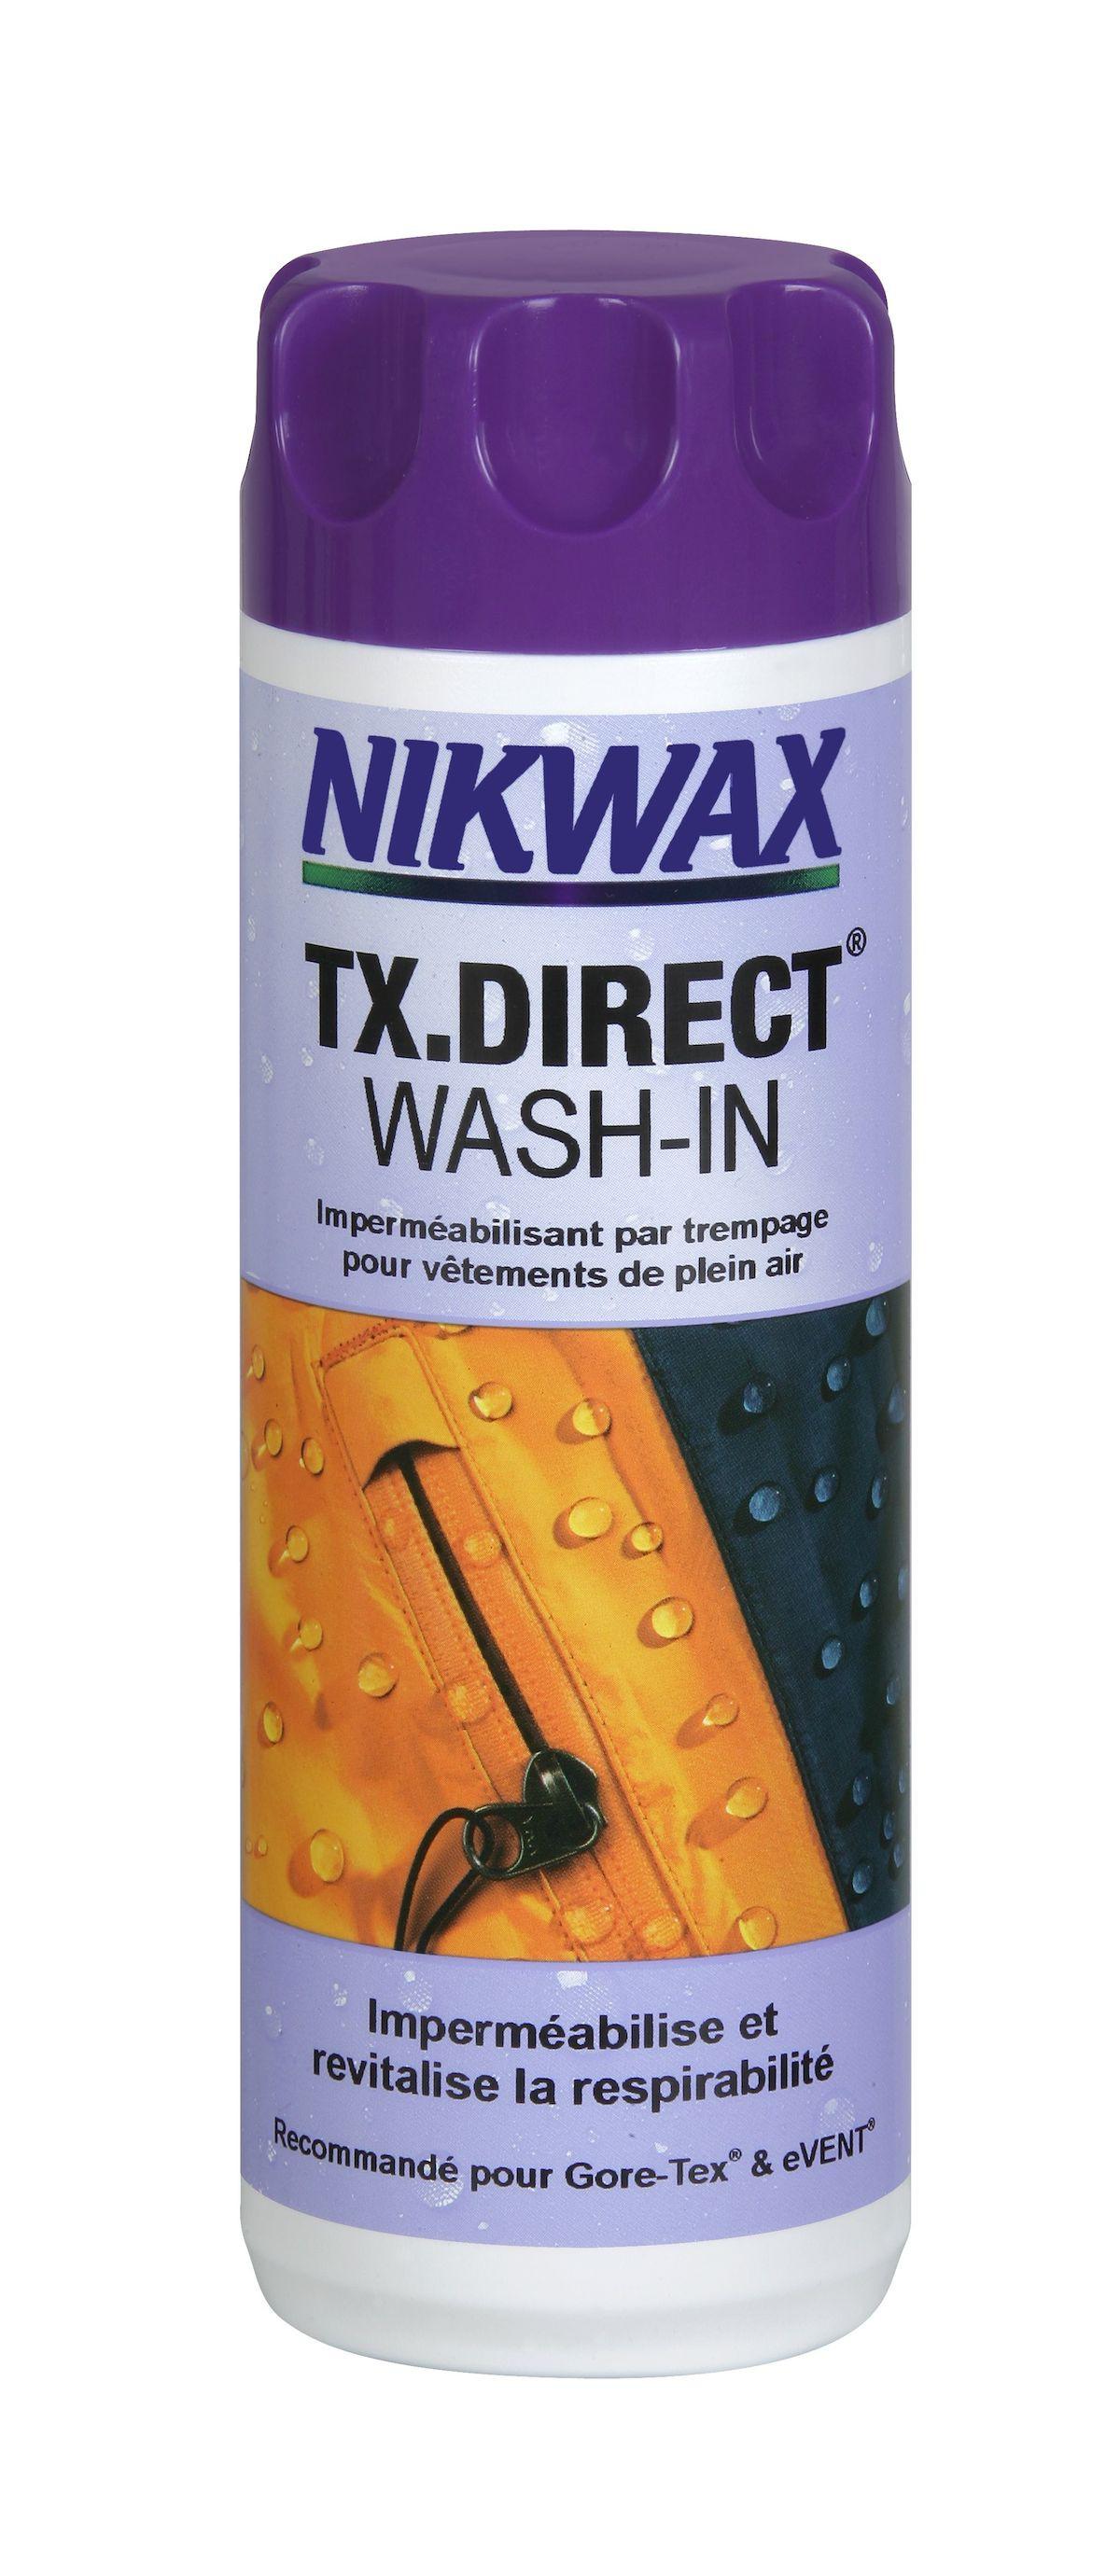 Nikwax TX. Direct - Textilimprägnierung